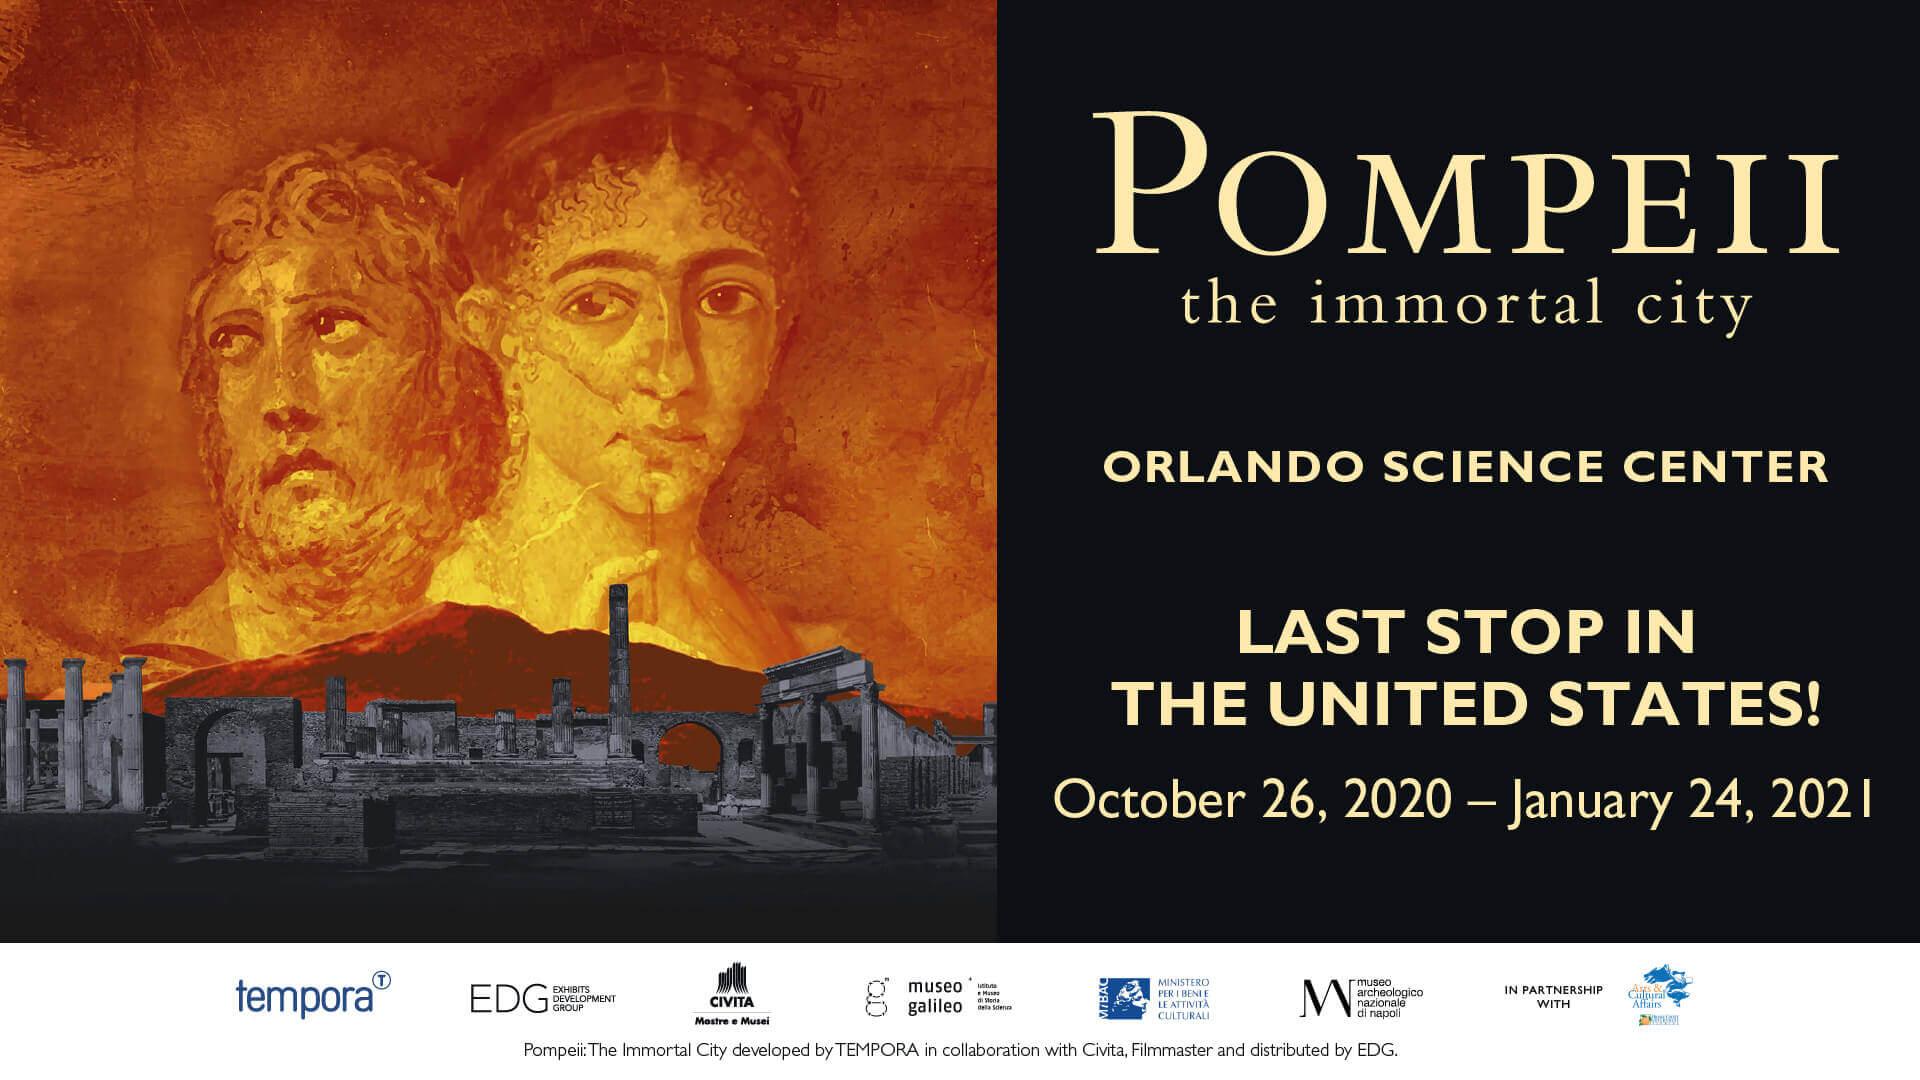 Pompeii: the Immortal City Exhibit - Premiering October 26, 2020